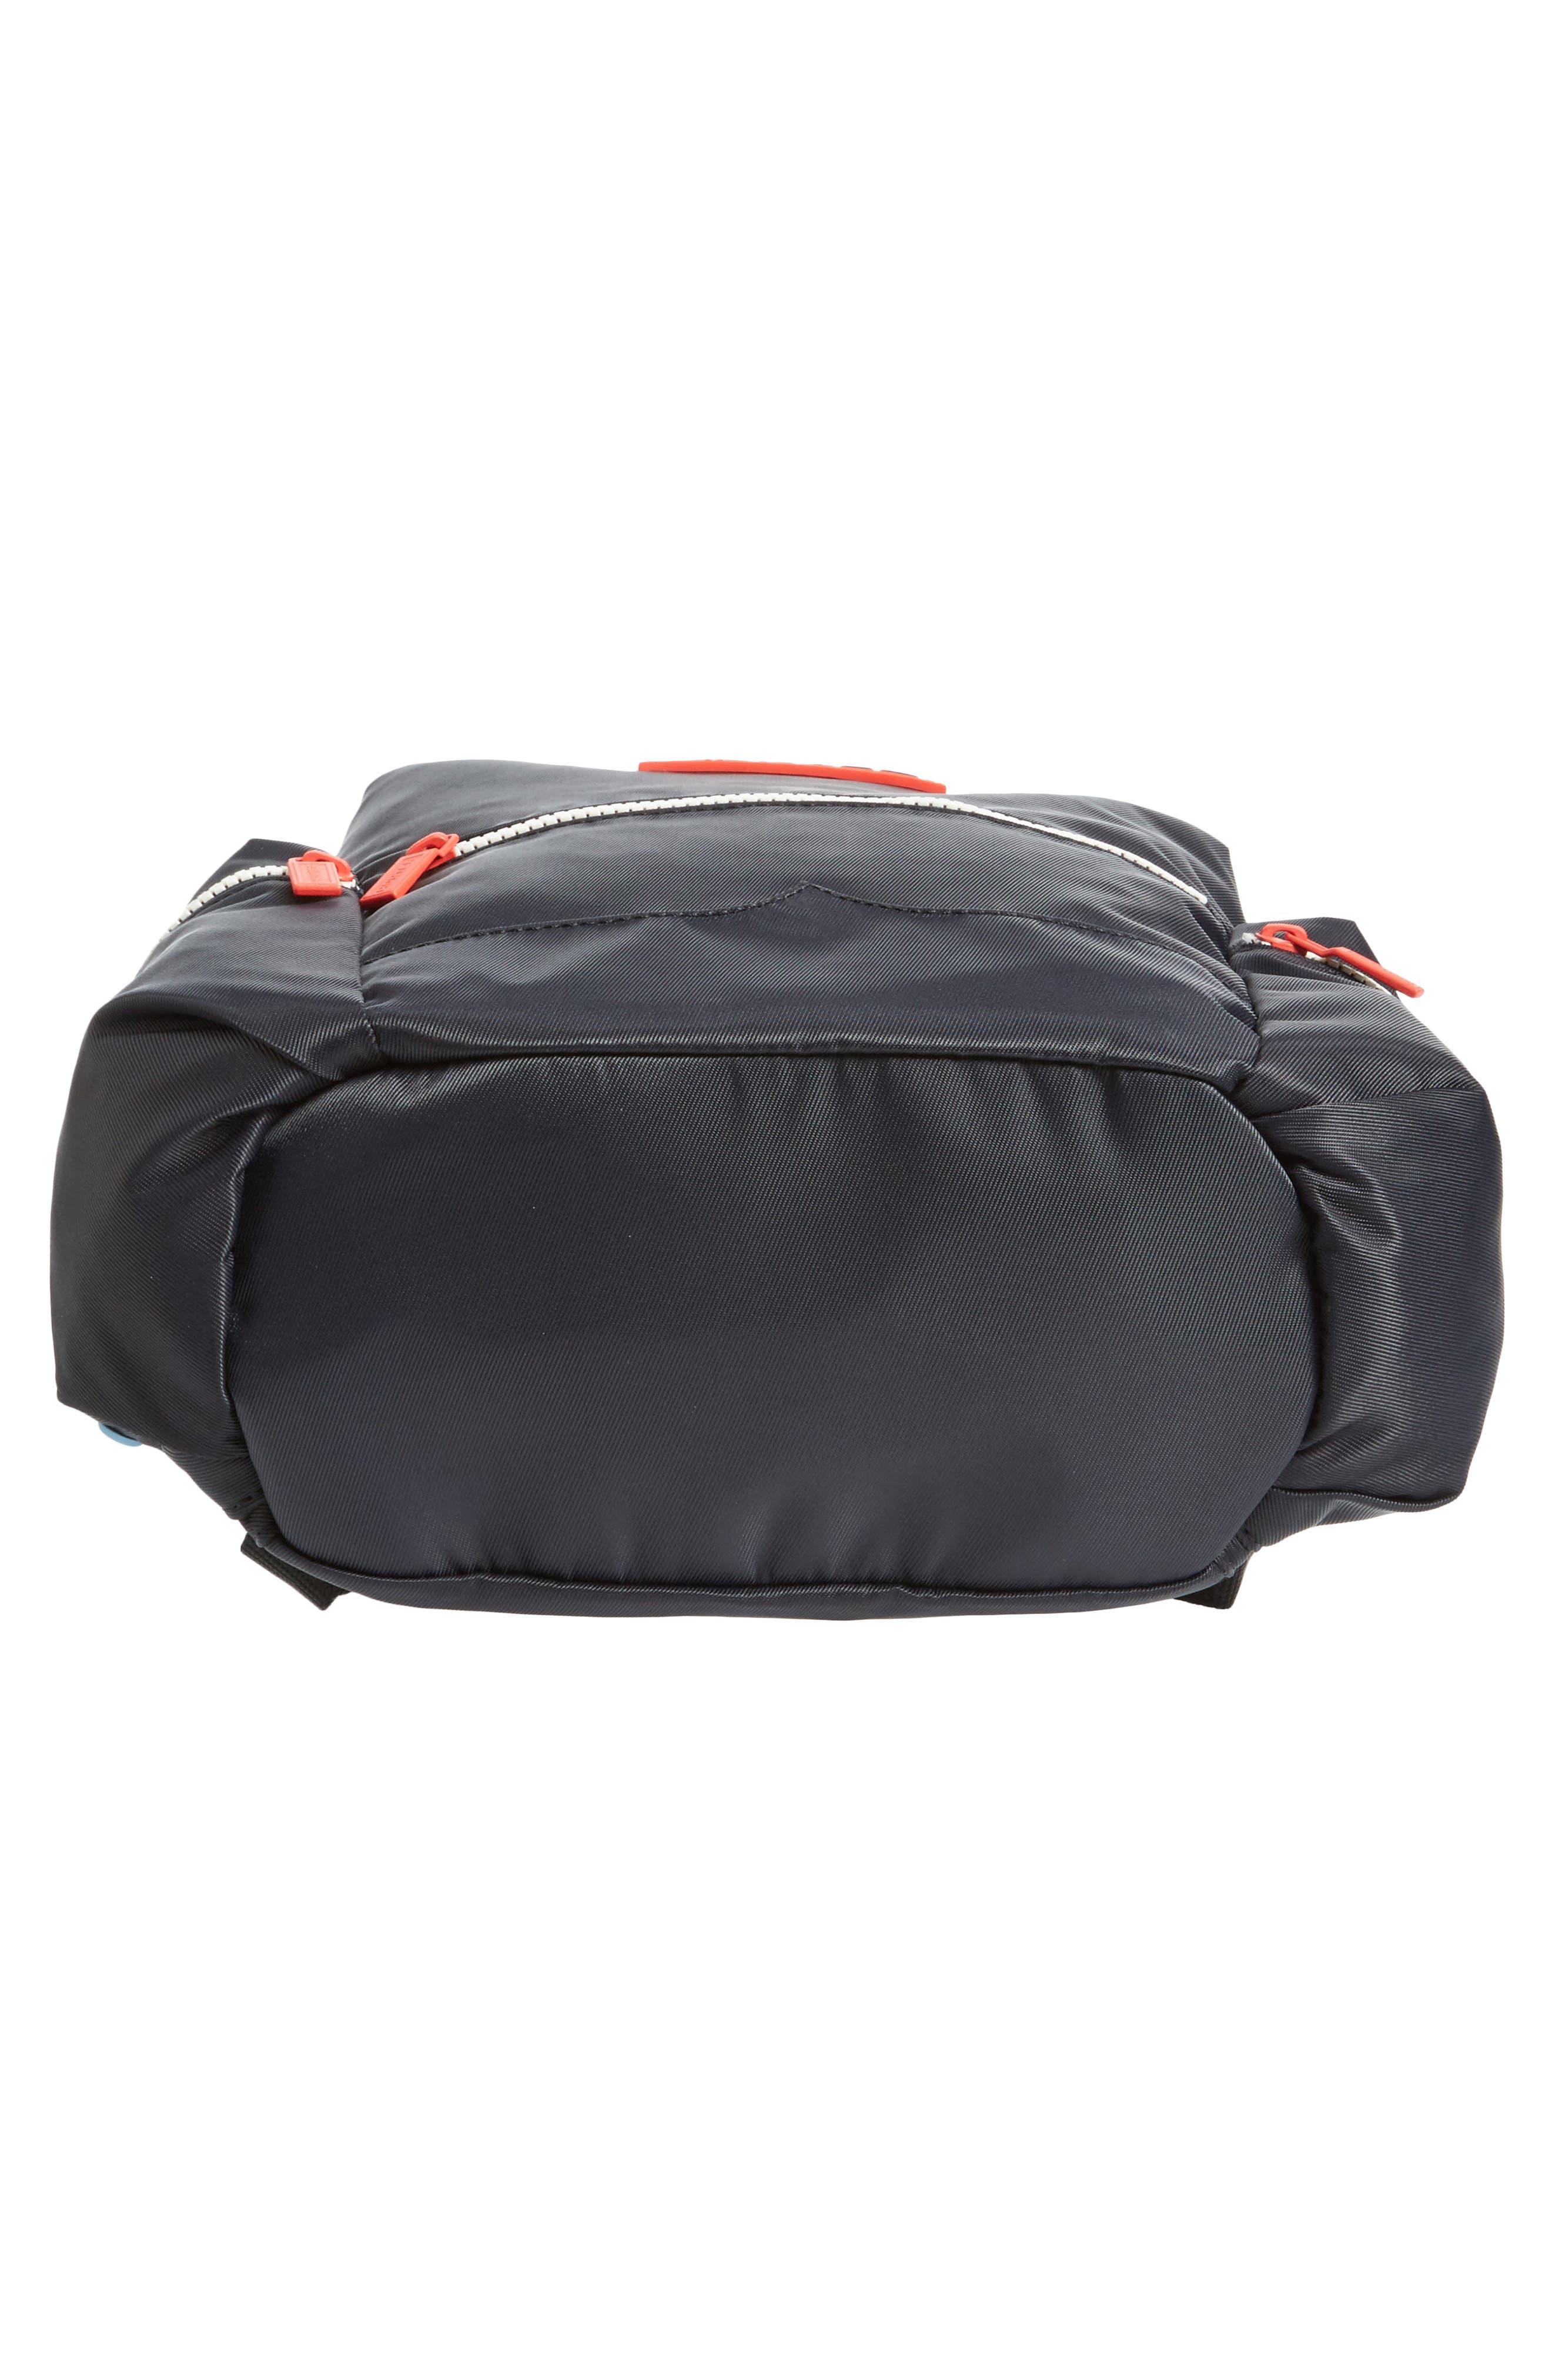 Original Mini Top Clip Nylon Backpack,                             Alternate thumbnail 6, color,                             Black